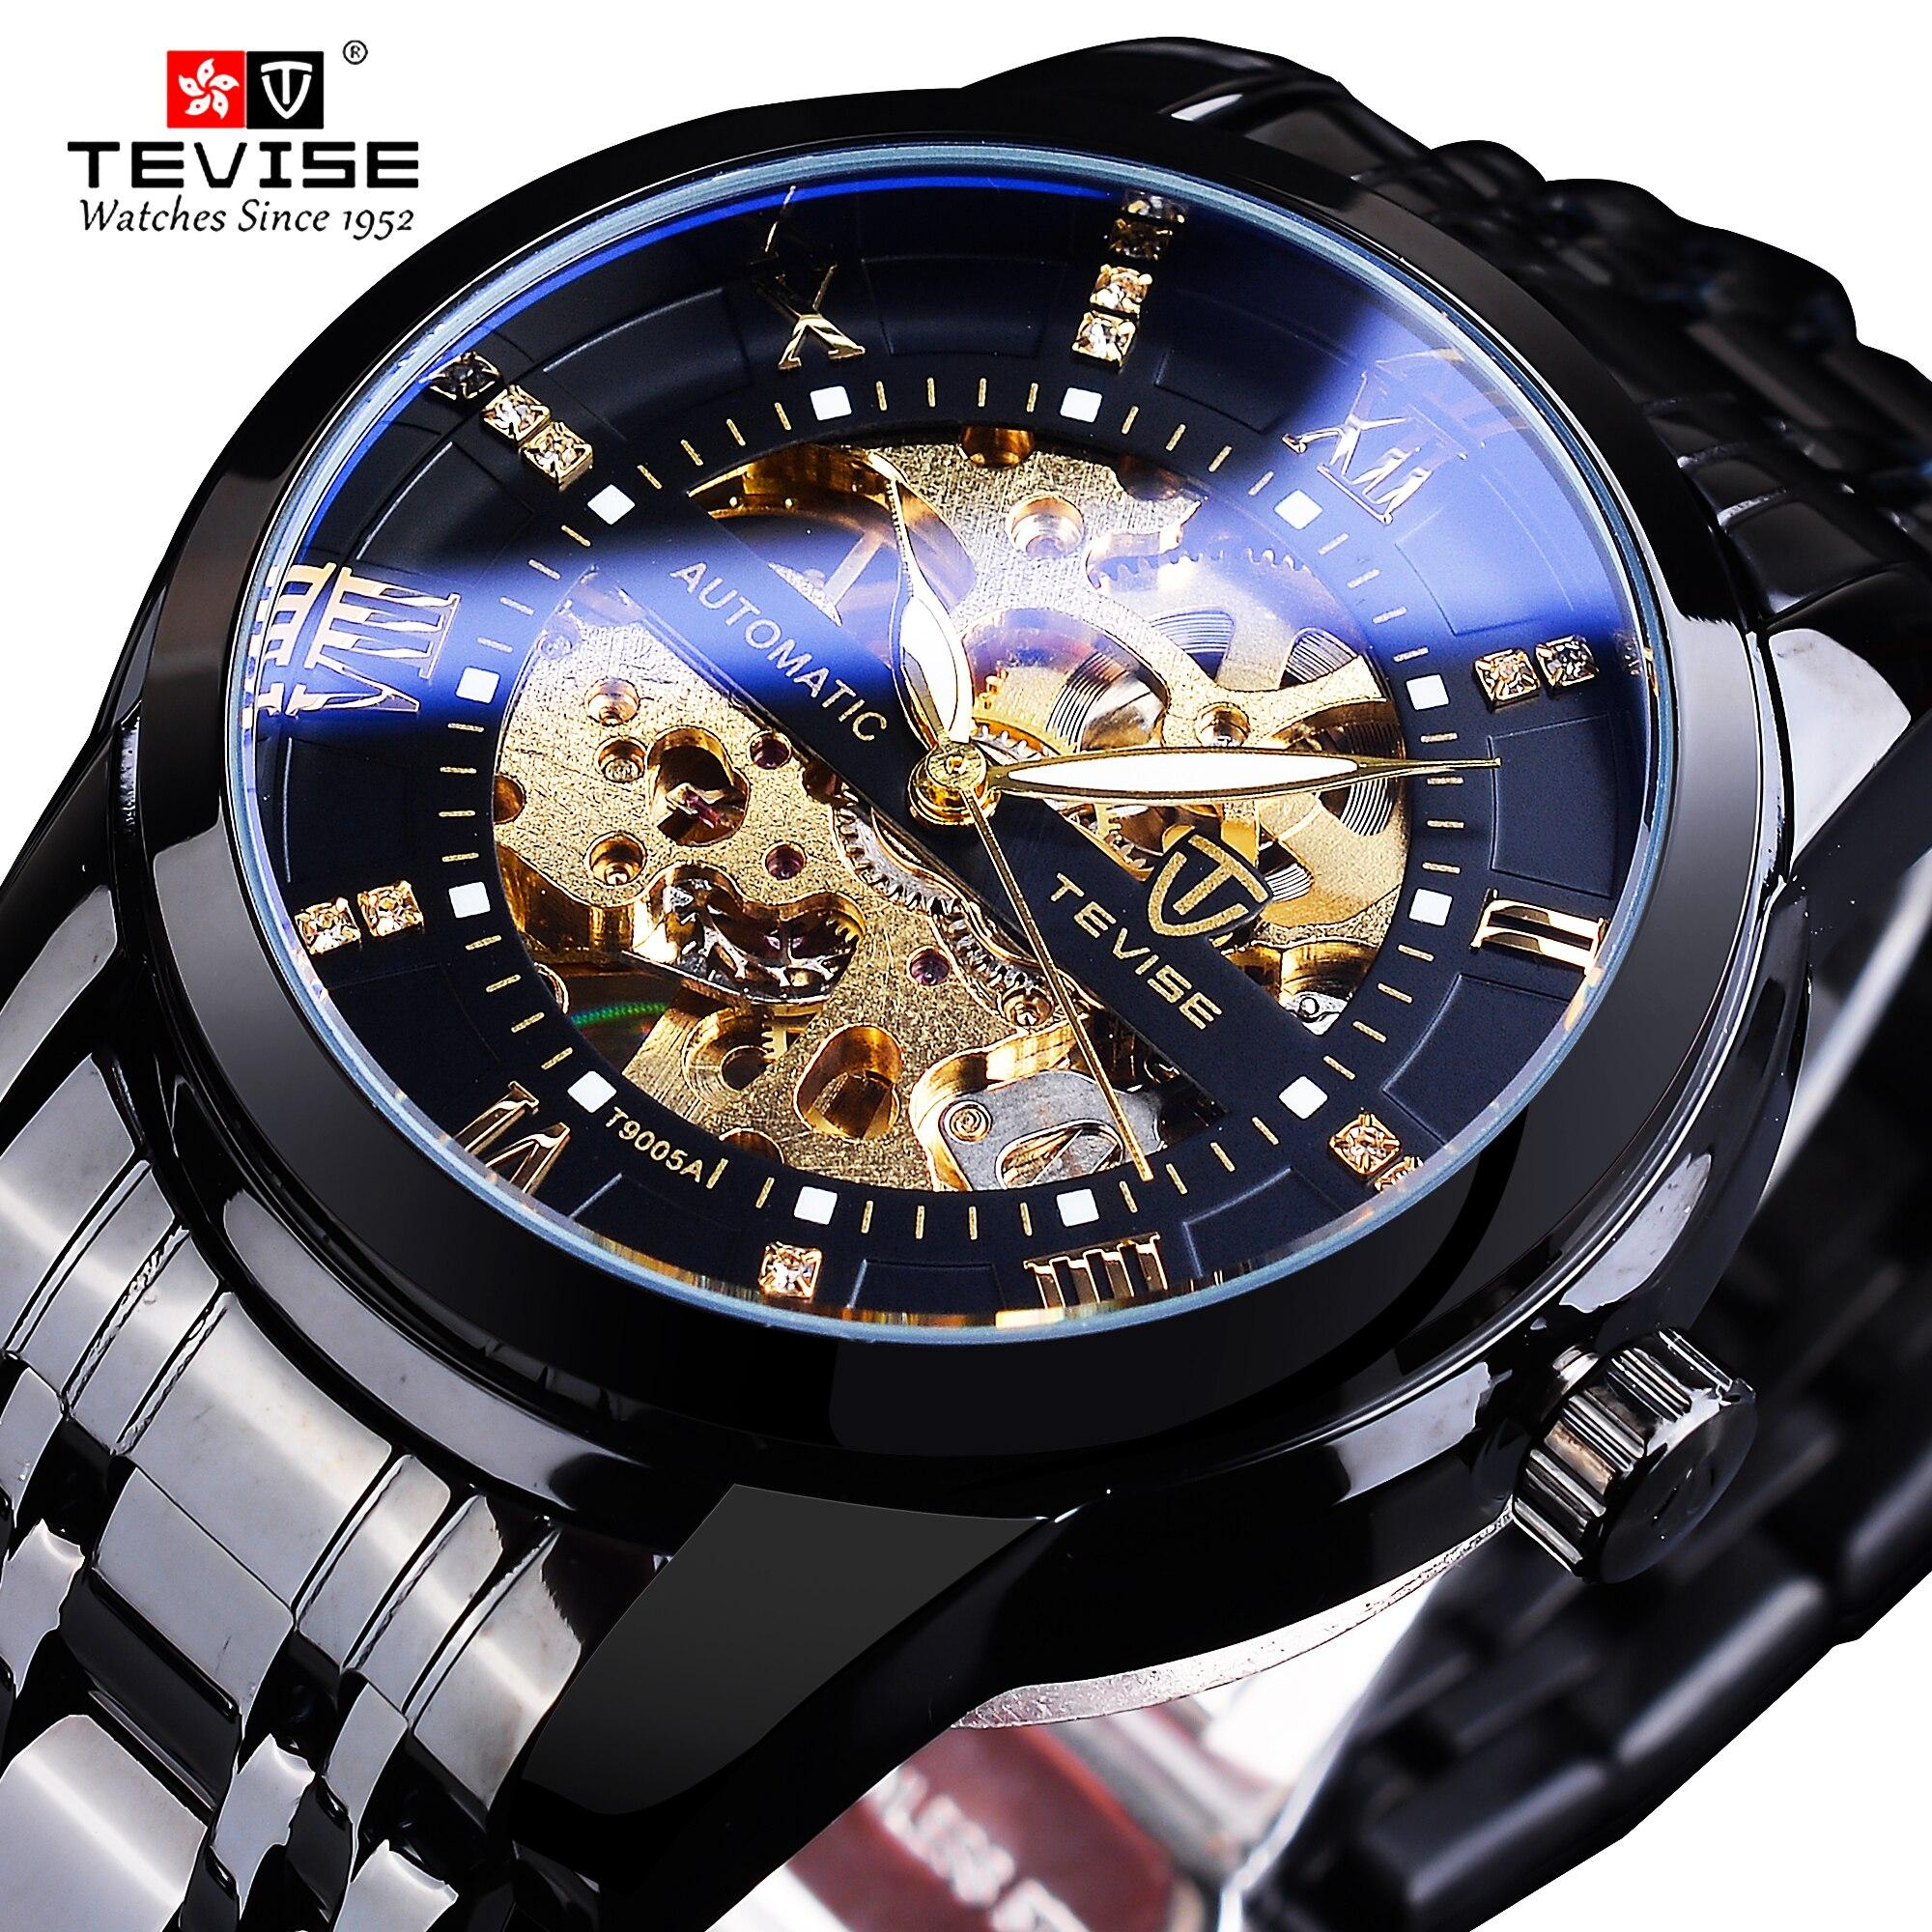 TEVISE-ساعة يد أنالوج للرجال ، ذهبية ، شفافة ، شاشة عرض ، هيكل عظمي ، أوتوماتيكية ، مقاومة للماء ، ذكر